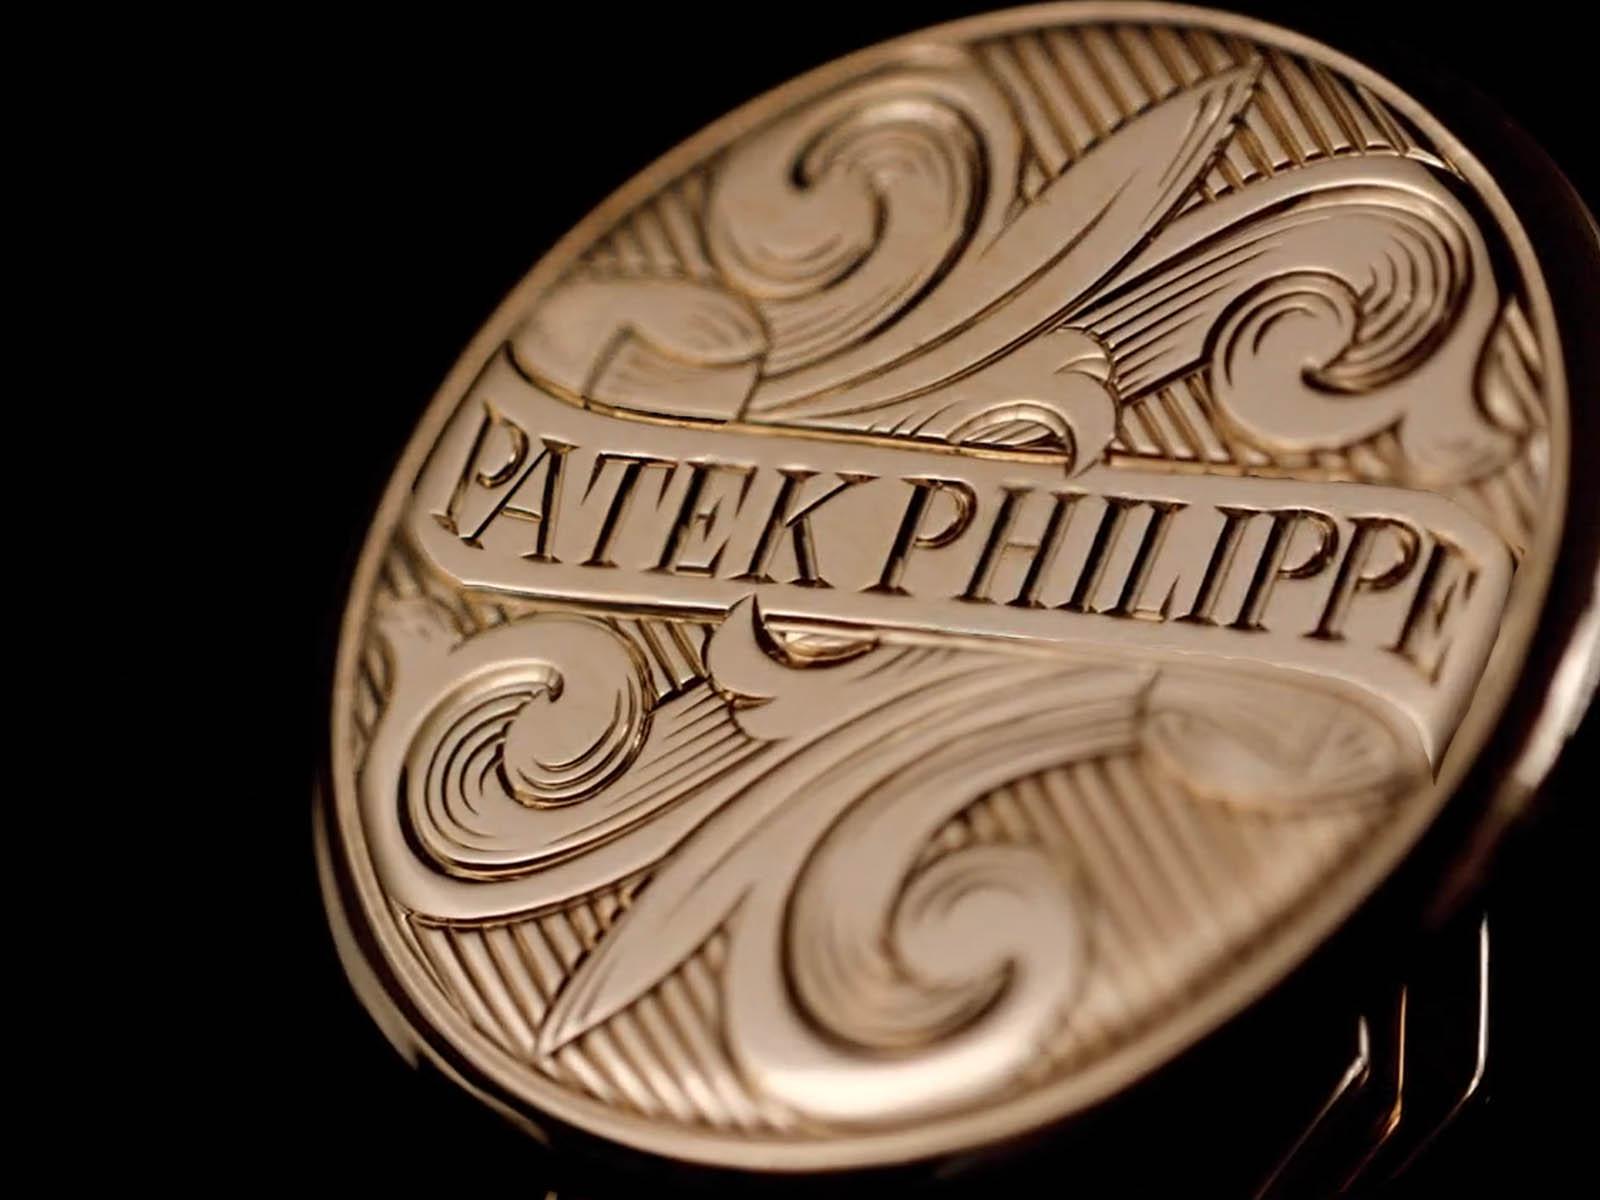 patek-philippe-rare-handicrafts-11.jpg